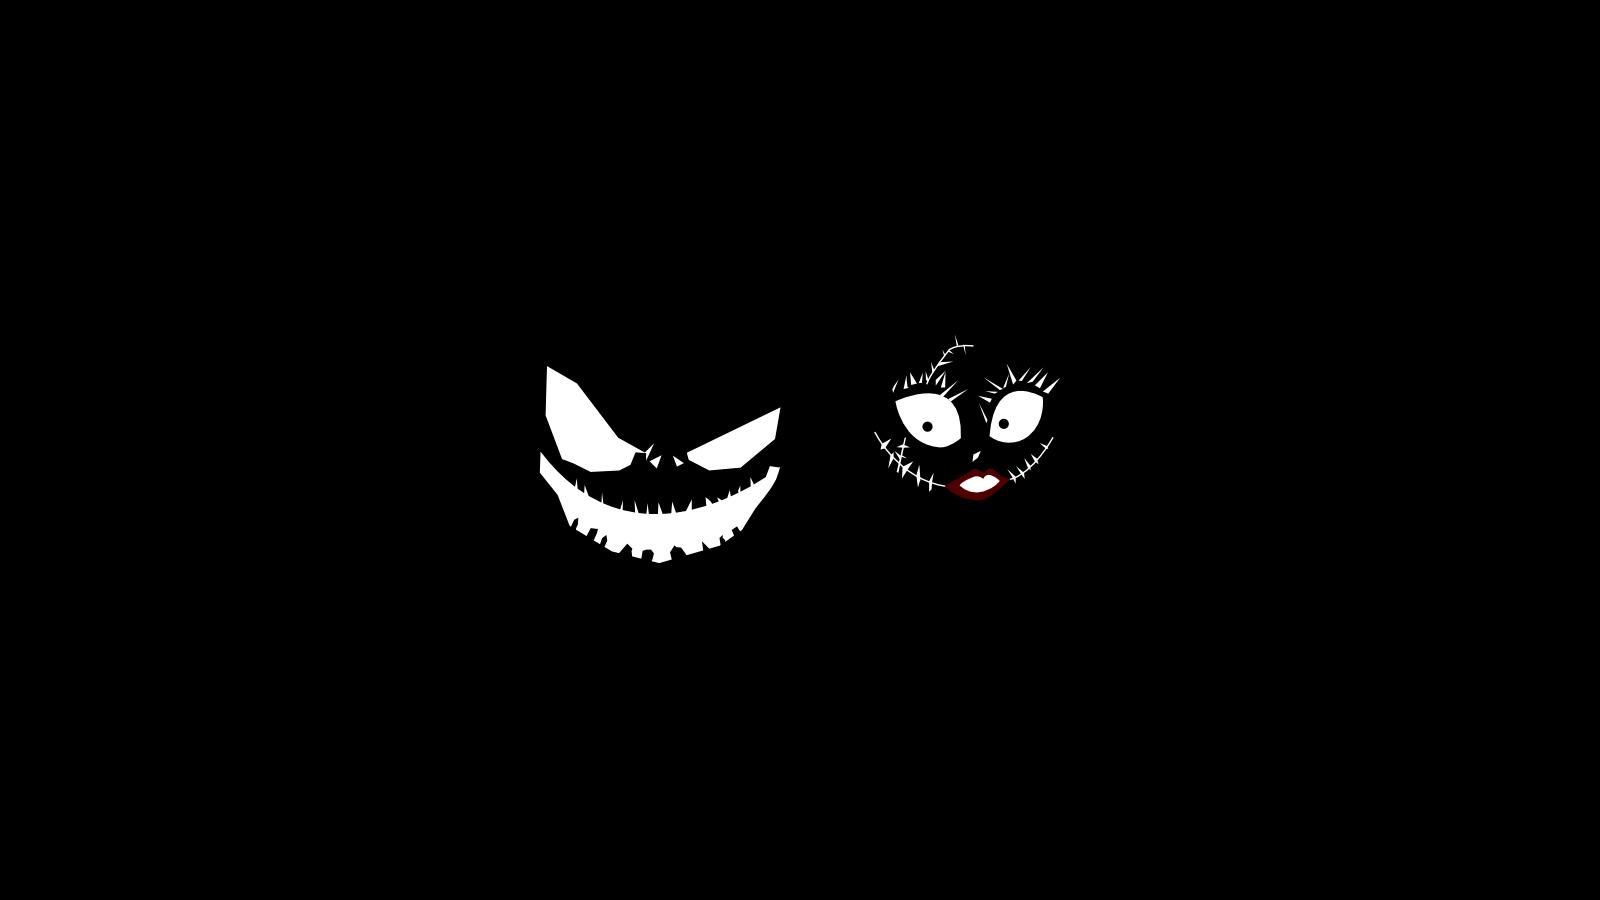 Free Download Nightmare Before Christmas Halloween Wallpaper